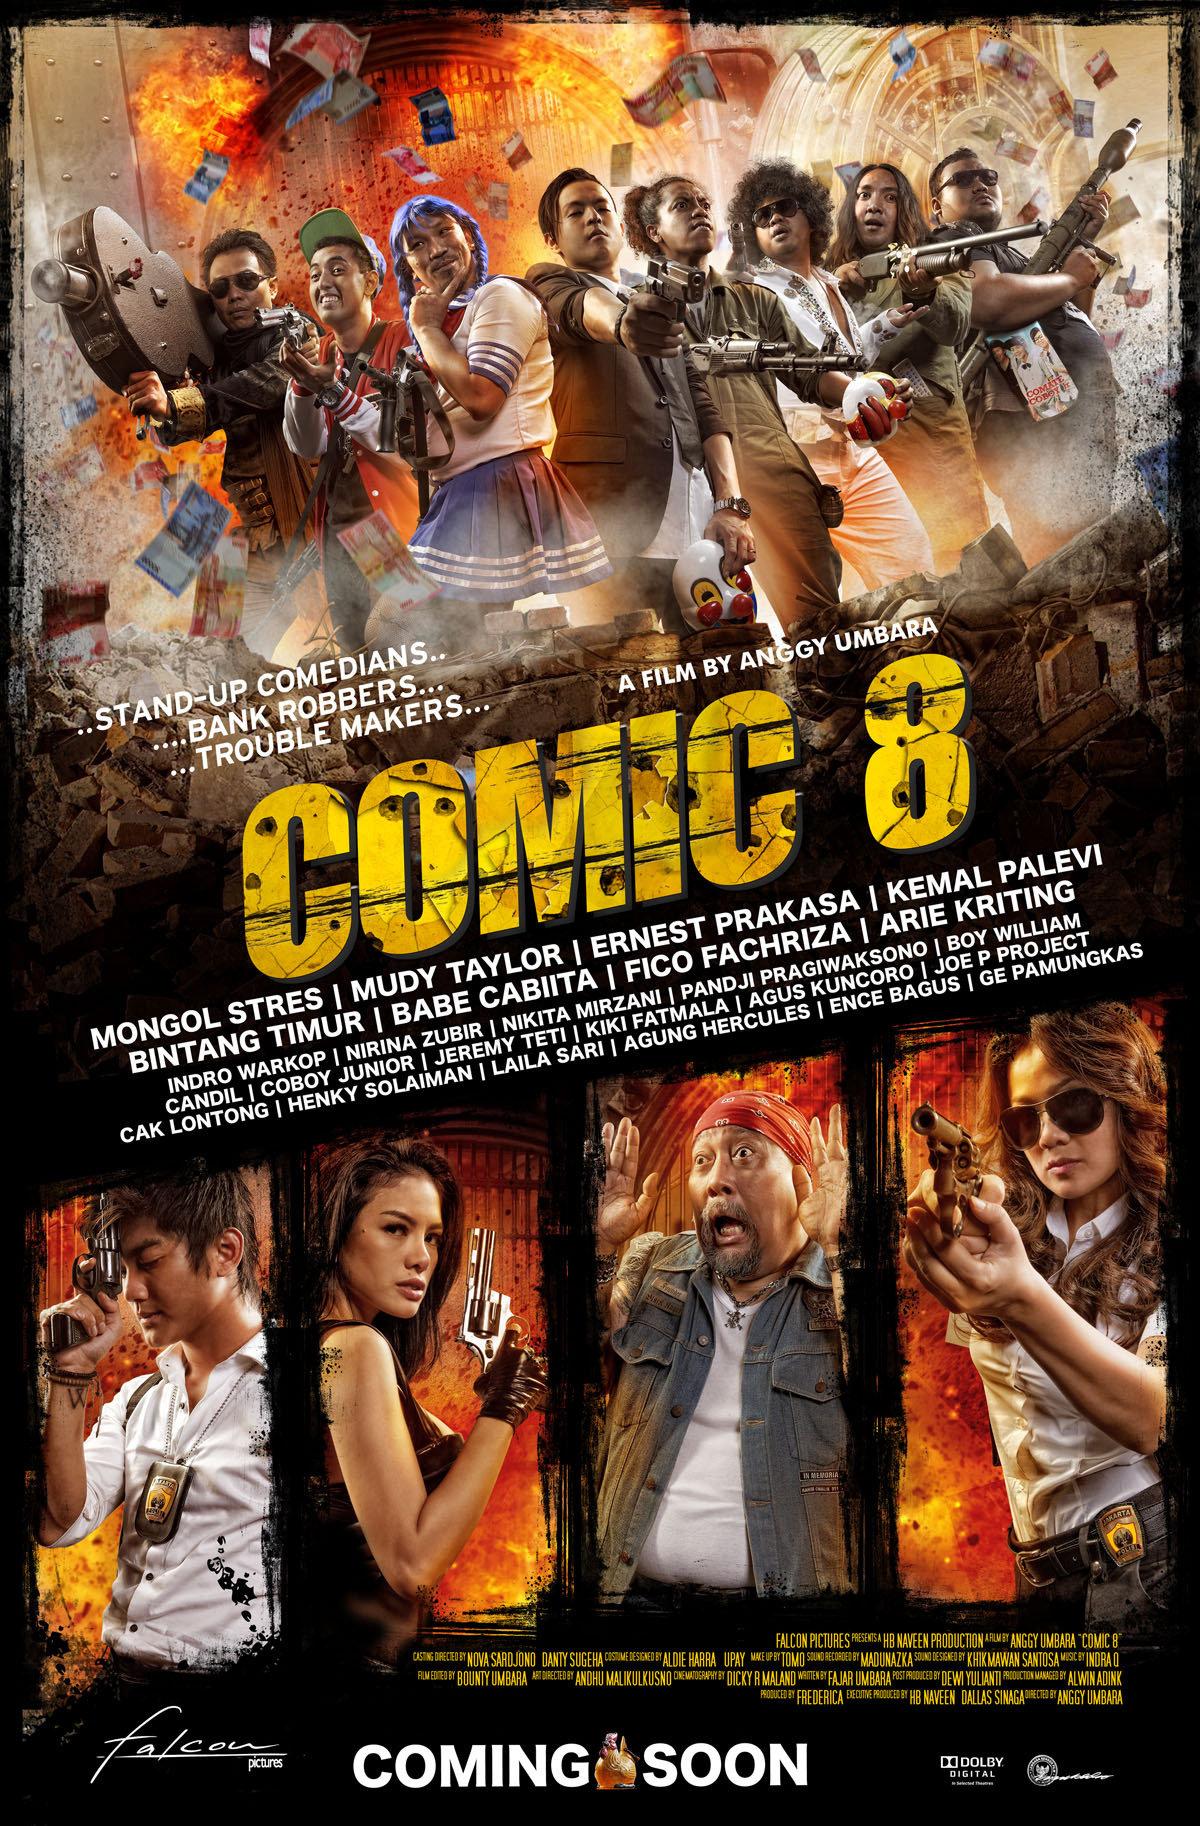 Comic 8 2014 Imdb